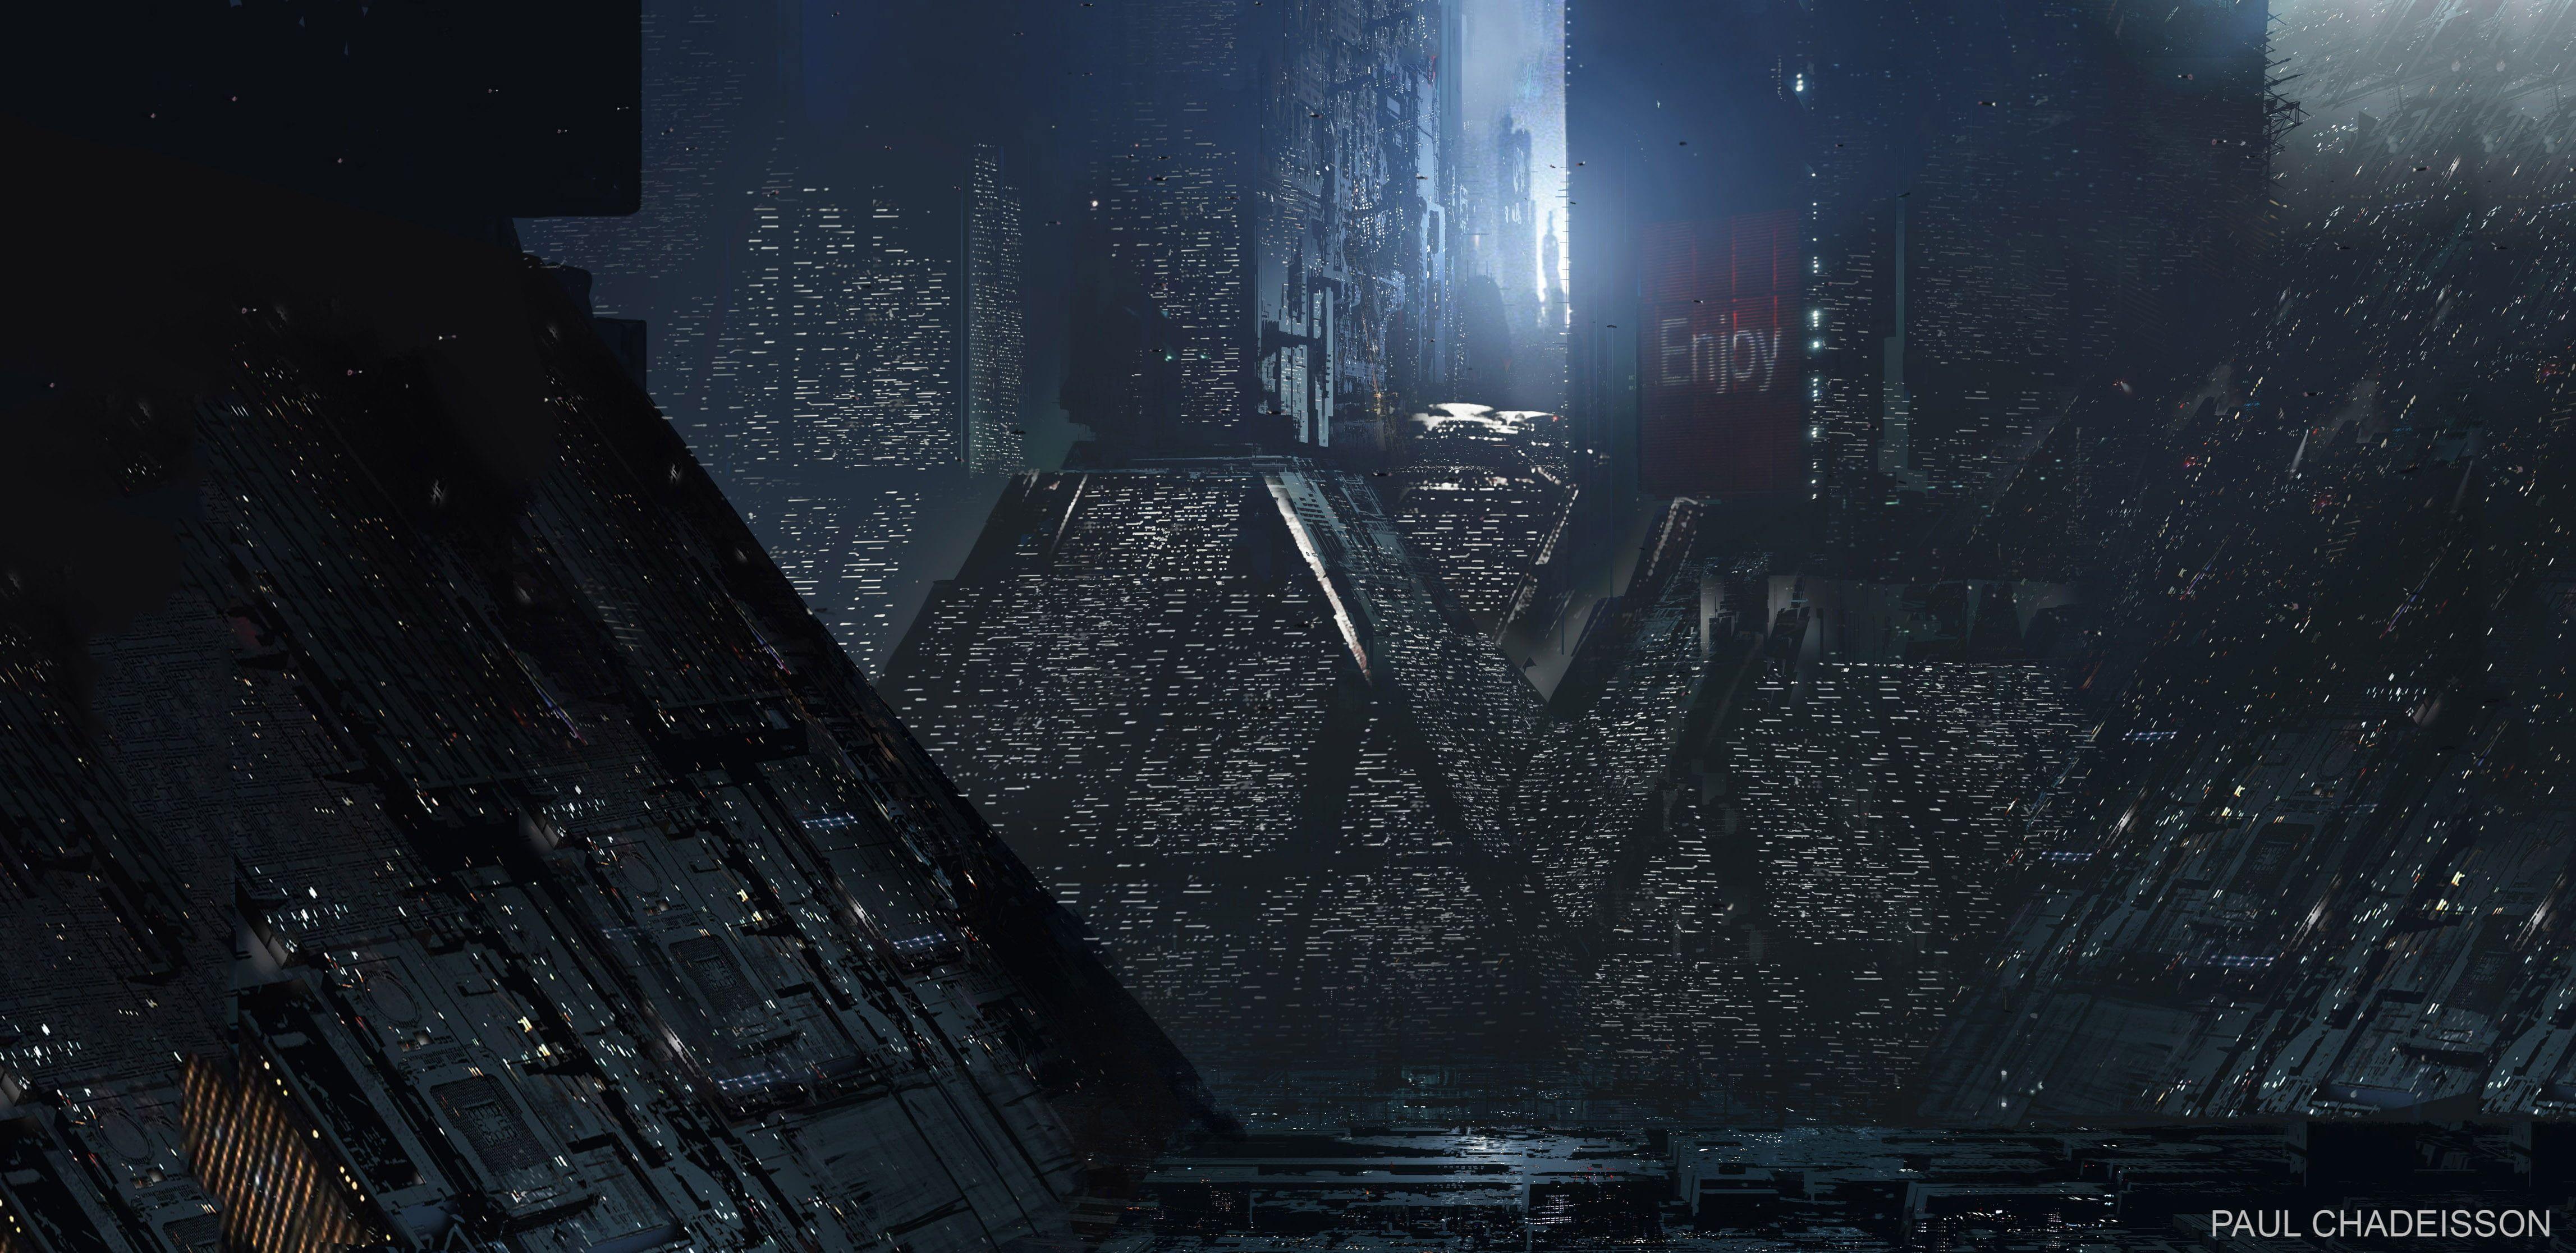 Untitled Blade Runner 2049 Movies Futuristic City Science Fiction 4k Wallpaper Hdwallpaper Desktop Blade Runner Blade Runner 2049 Concept Art